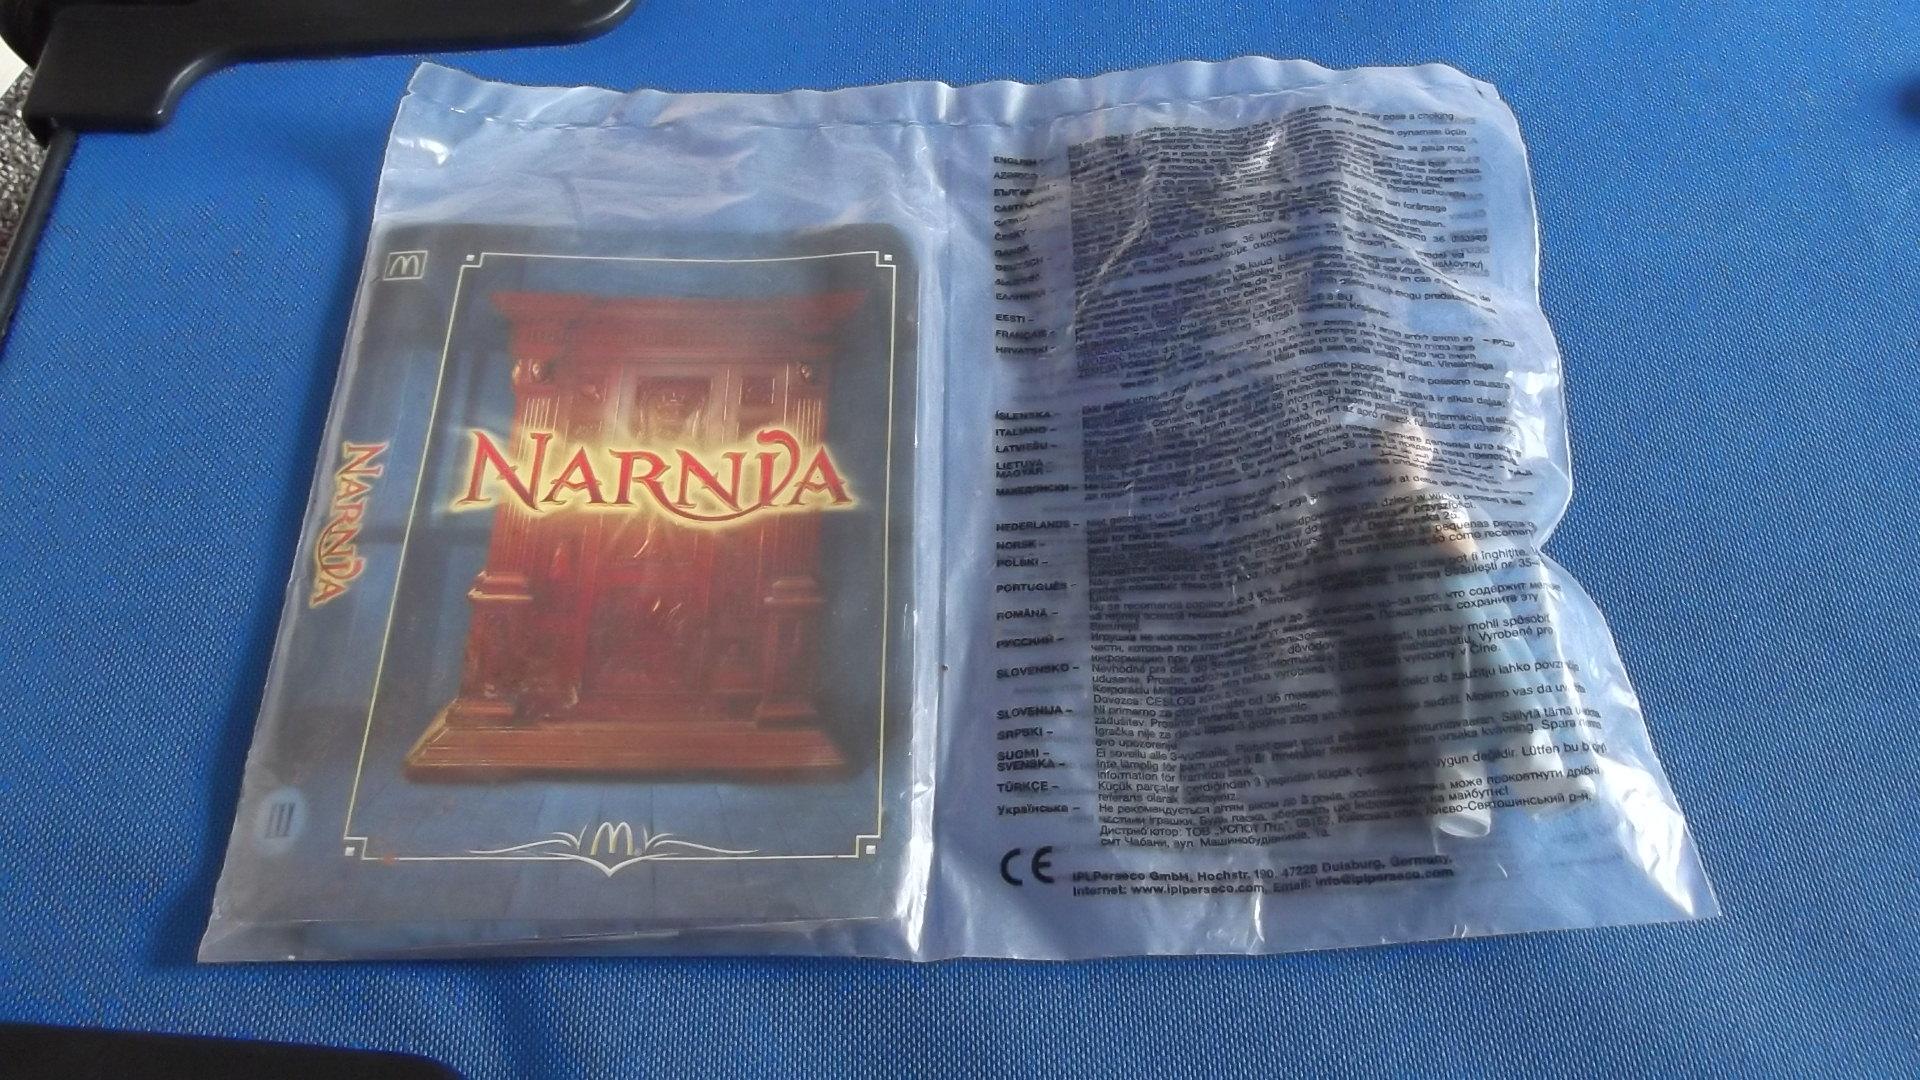 McDonalds Narnia Edmund Toy From 2005 New